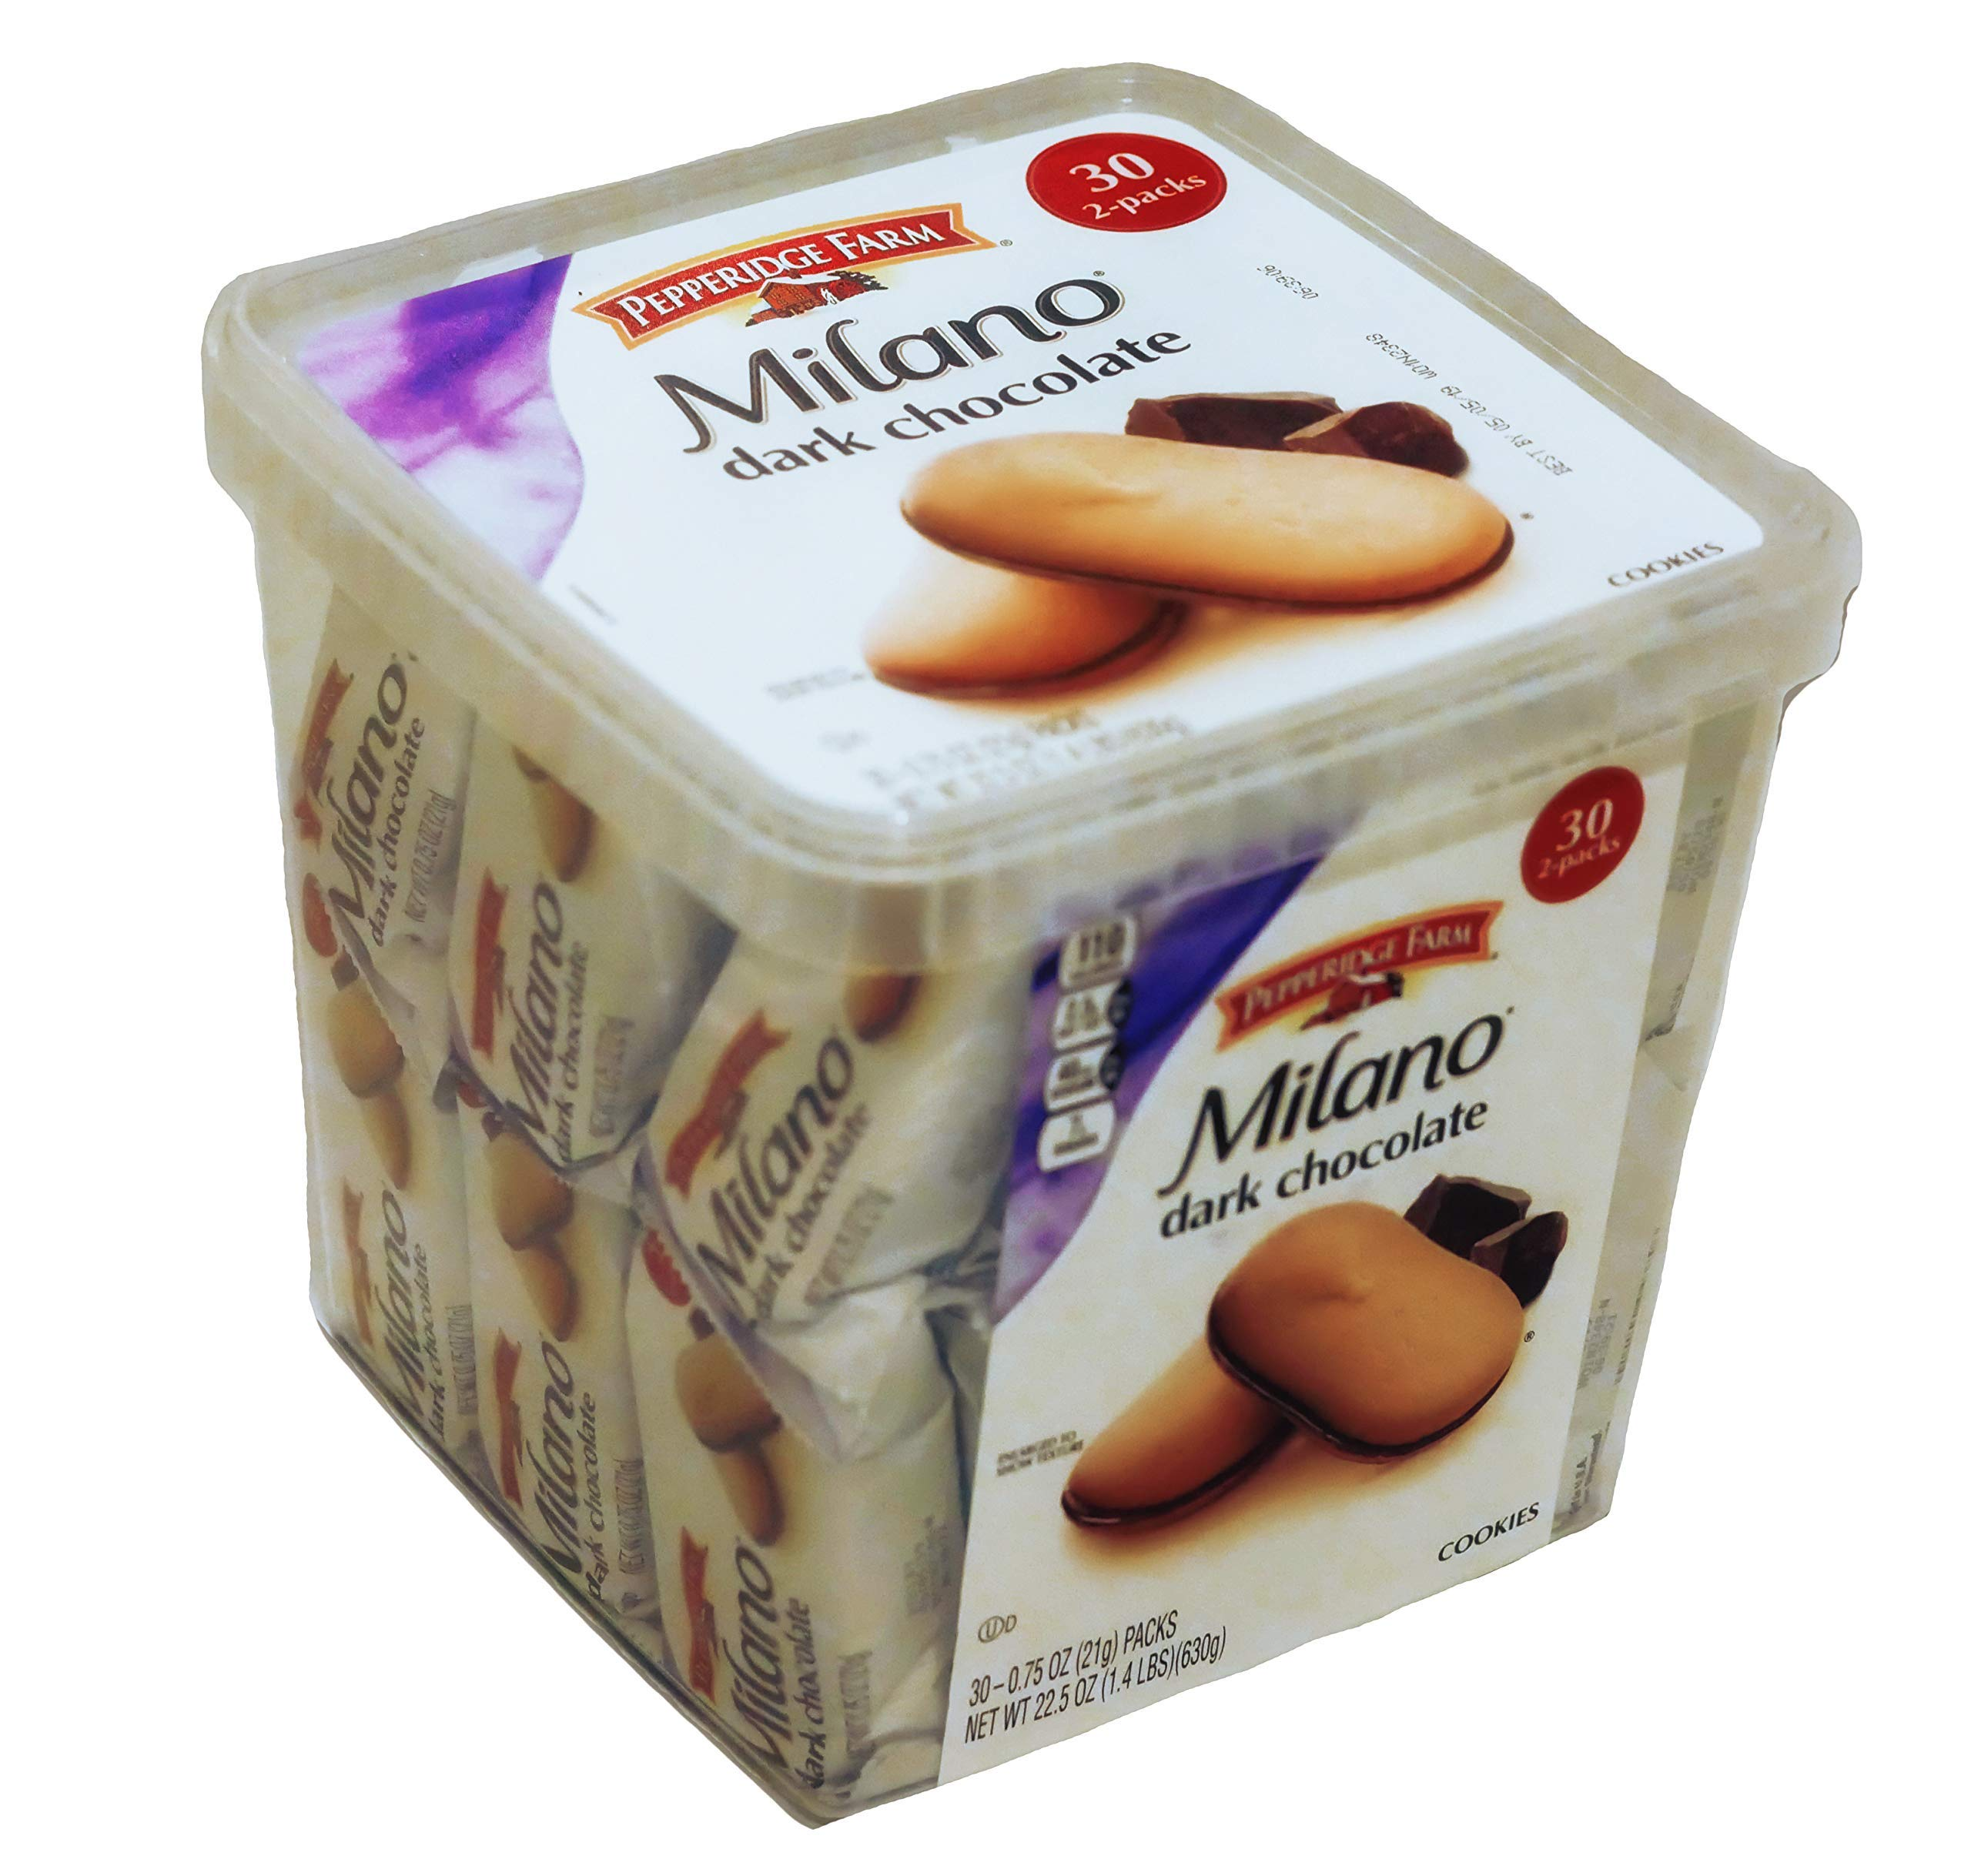 Pepperidge Farm, Milano, Cookies, Dark Chocolate, 22.5 oz, Multi-pack, Tub, 2-packs, 30-count by Pepperidge Farm (Image #1)